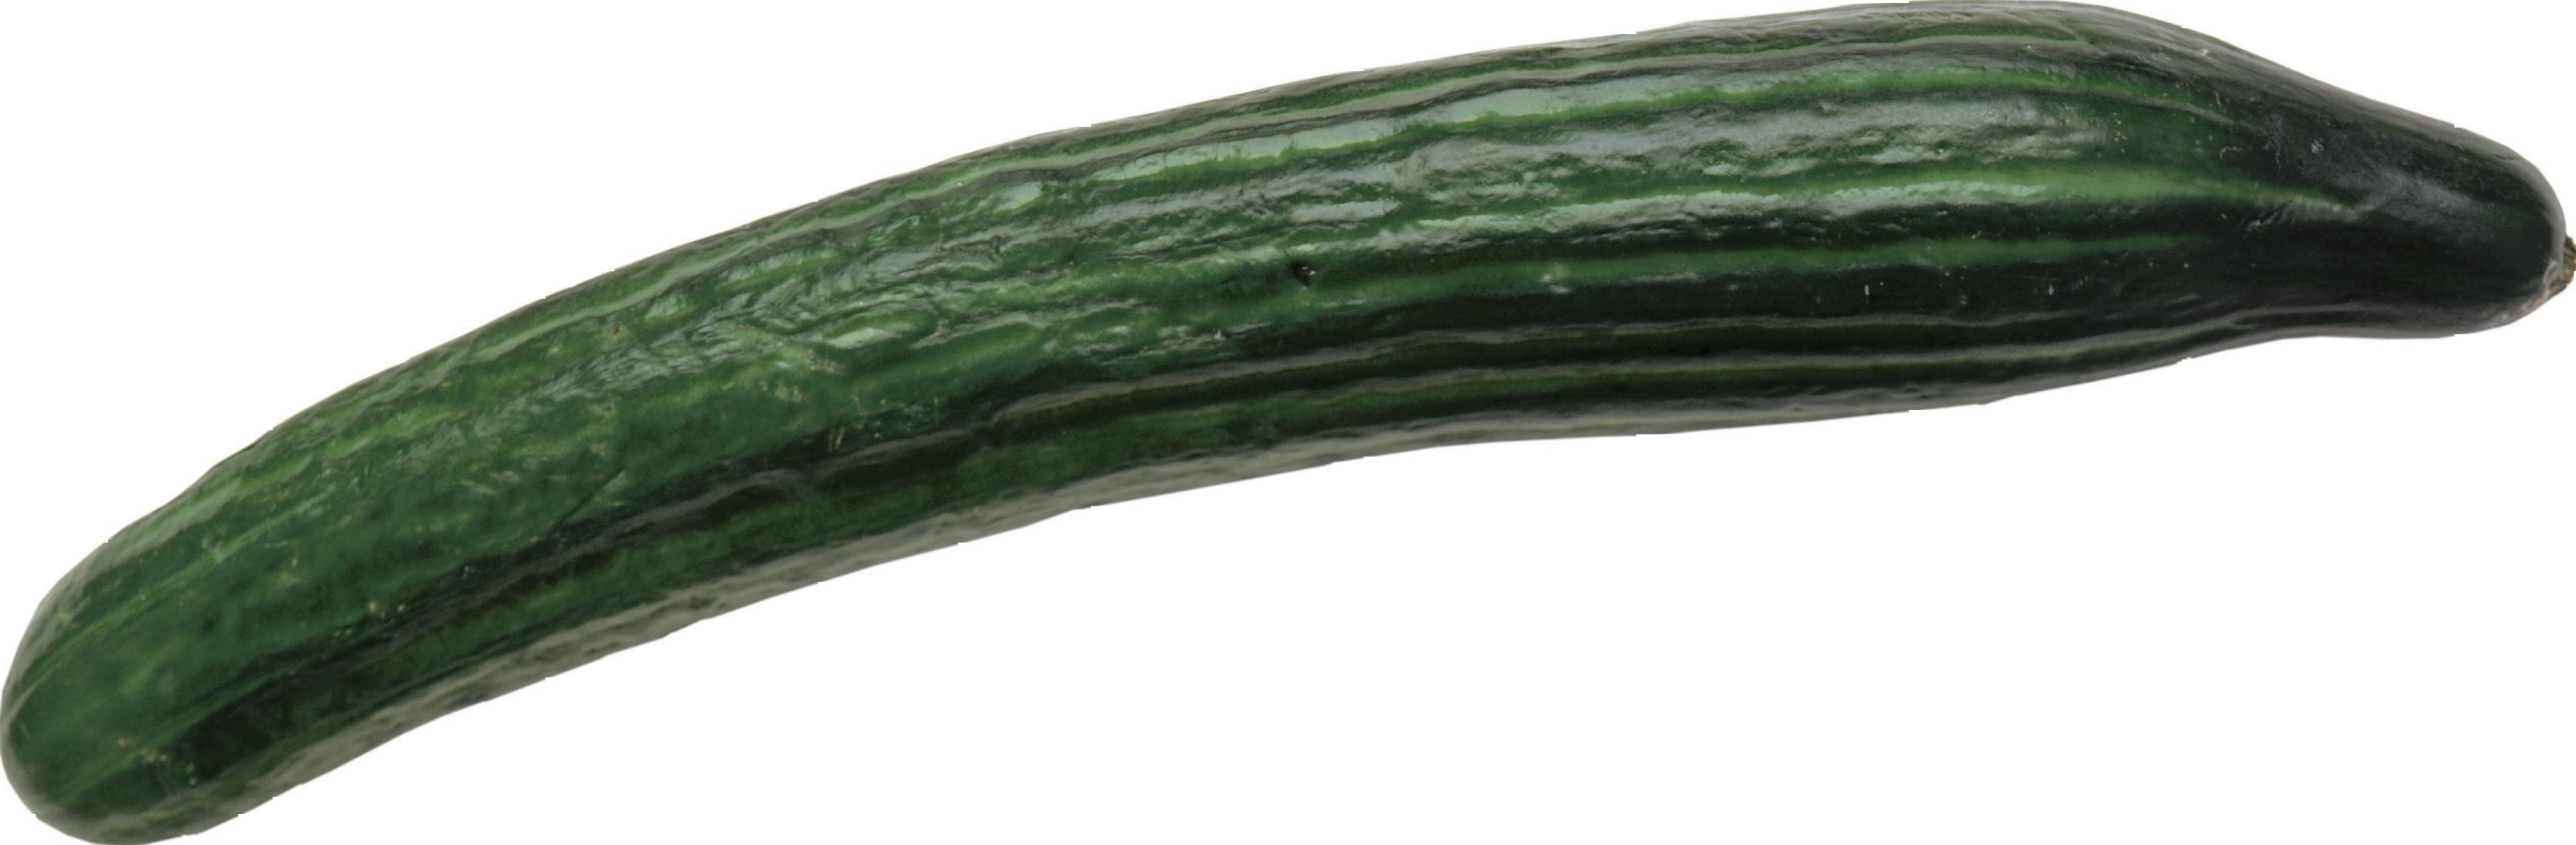 cucumber png design cliparts borders design clipart images